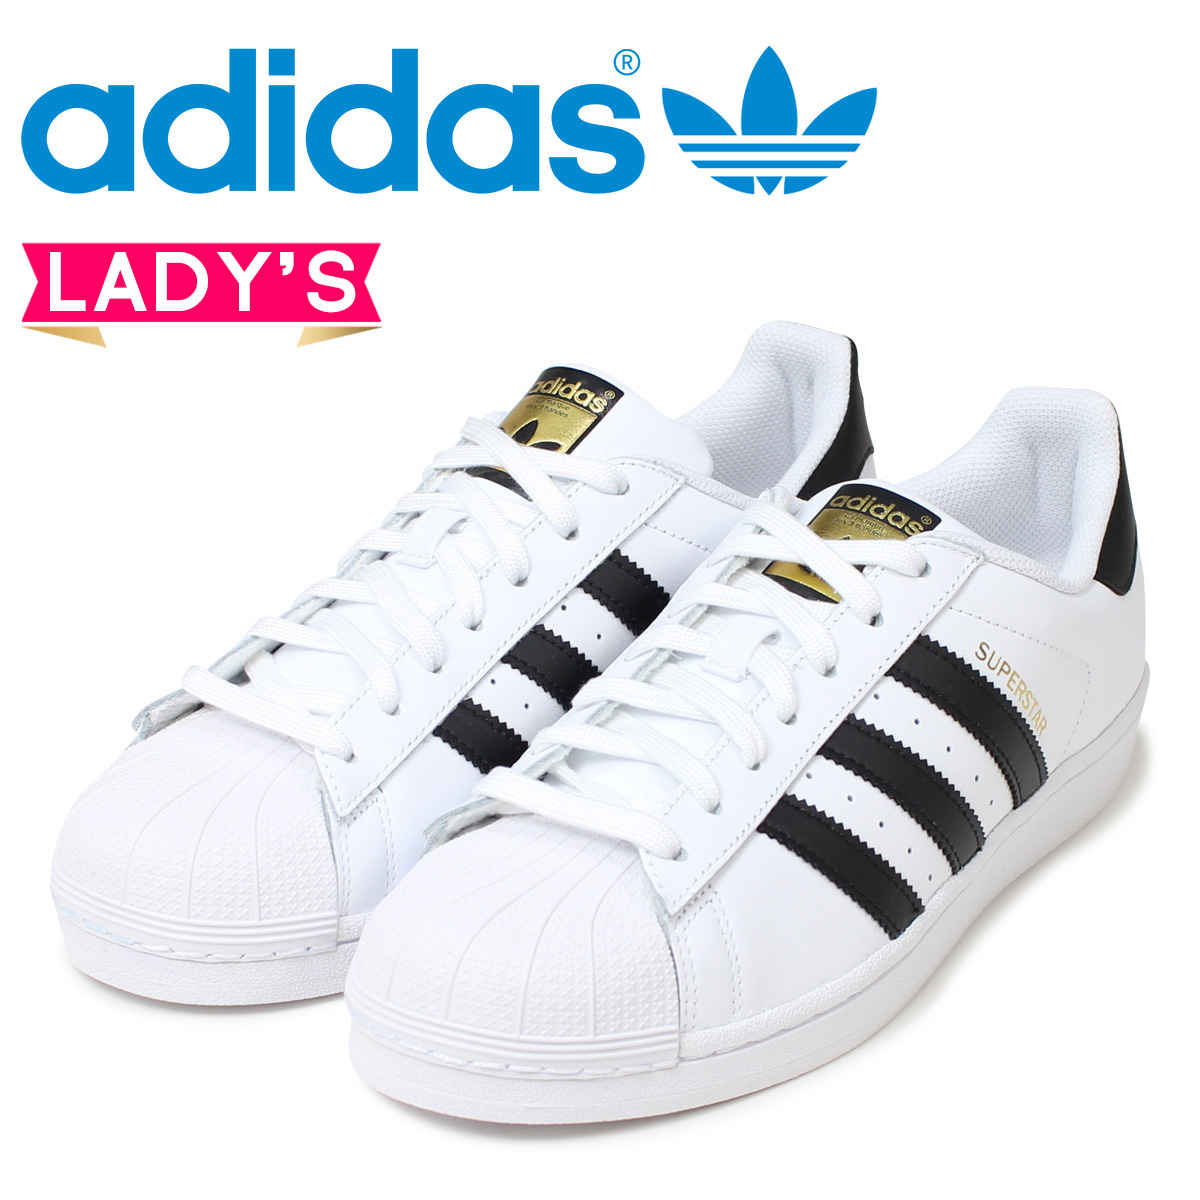 adidas Originals Adidas originals superstar women sneakers Lady's SUPERSTAR W C77153 shoes white black [198]